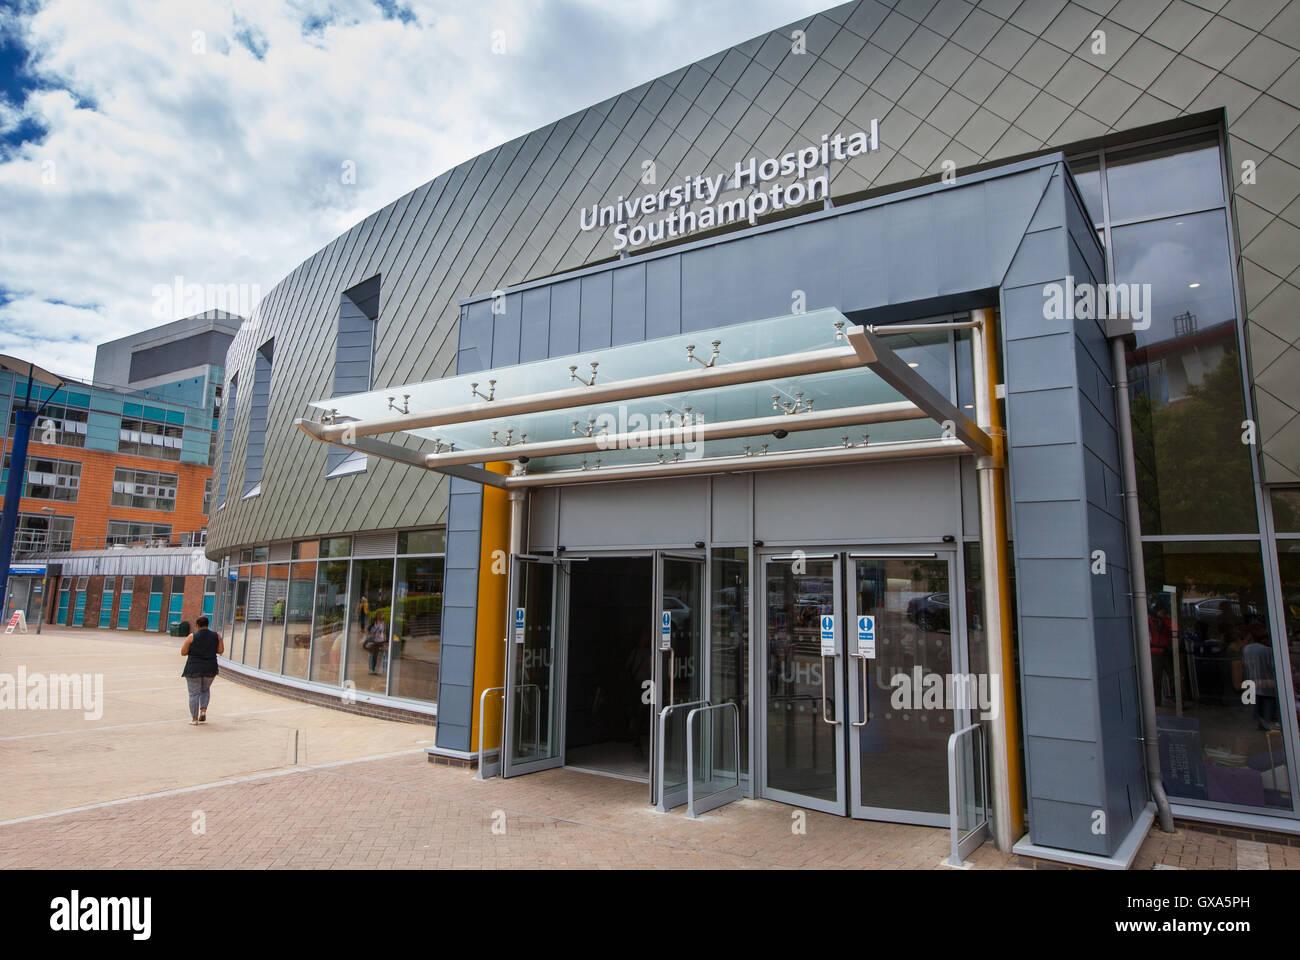 Southampton General Hospital (auch bekannt als University Hospital Southampton) Foto vom neuen Haupteingang geöffnet Stockbild